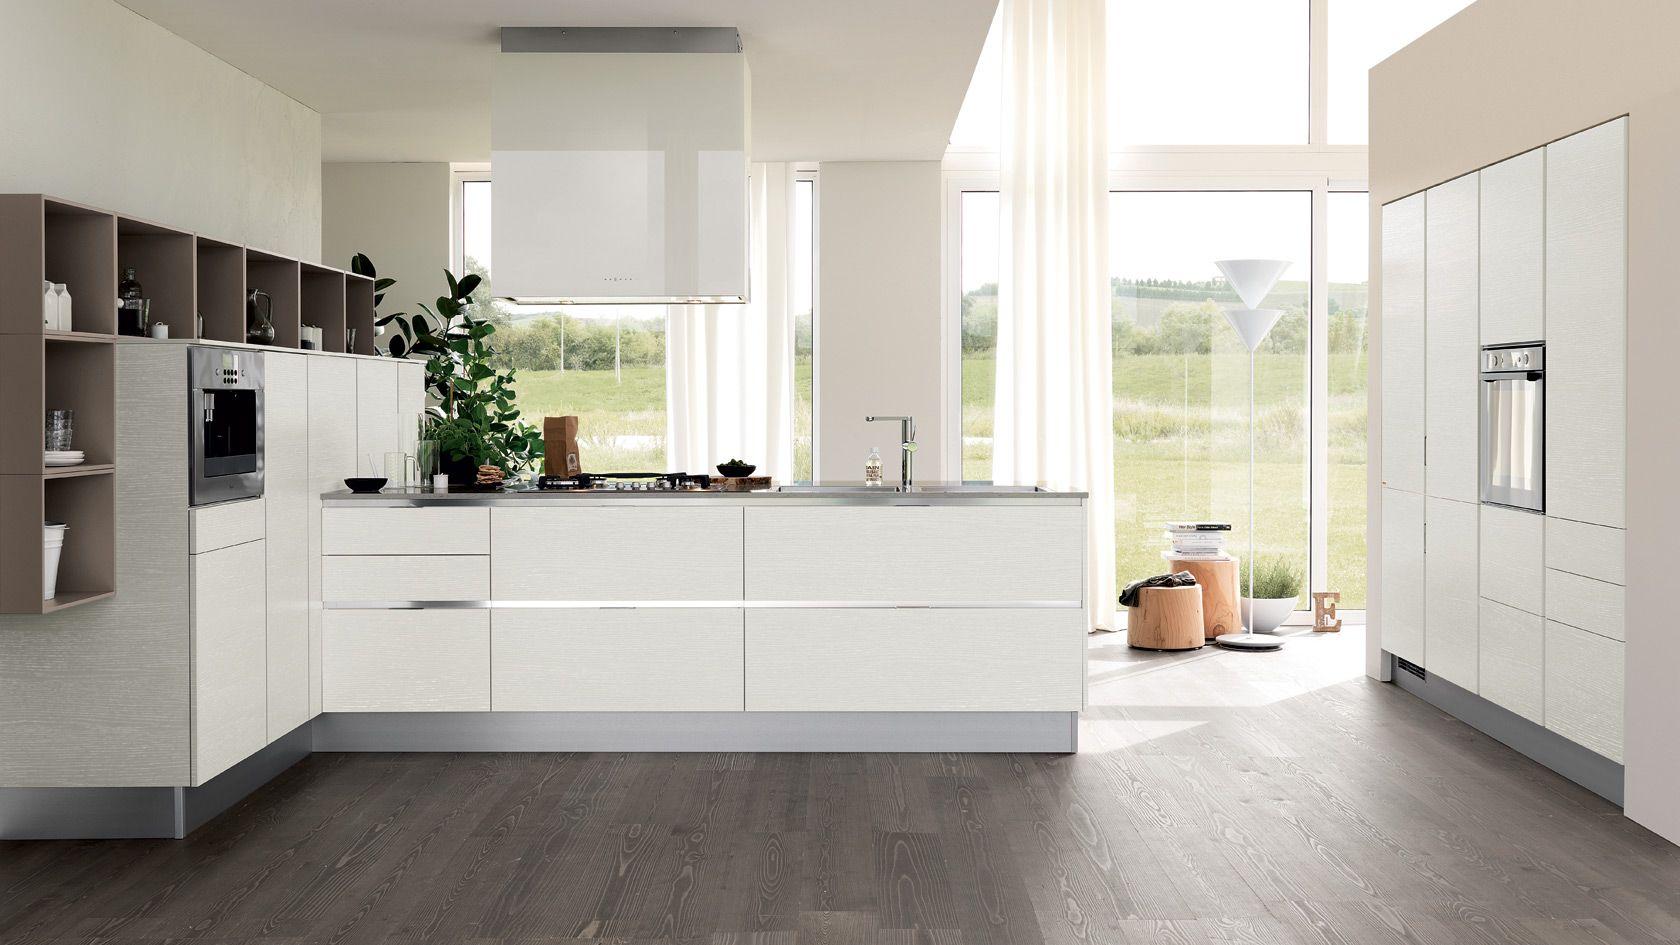 Cucina Mood Scavolini | kitchens | Pinterest | Kitchens, Kitchen ...